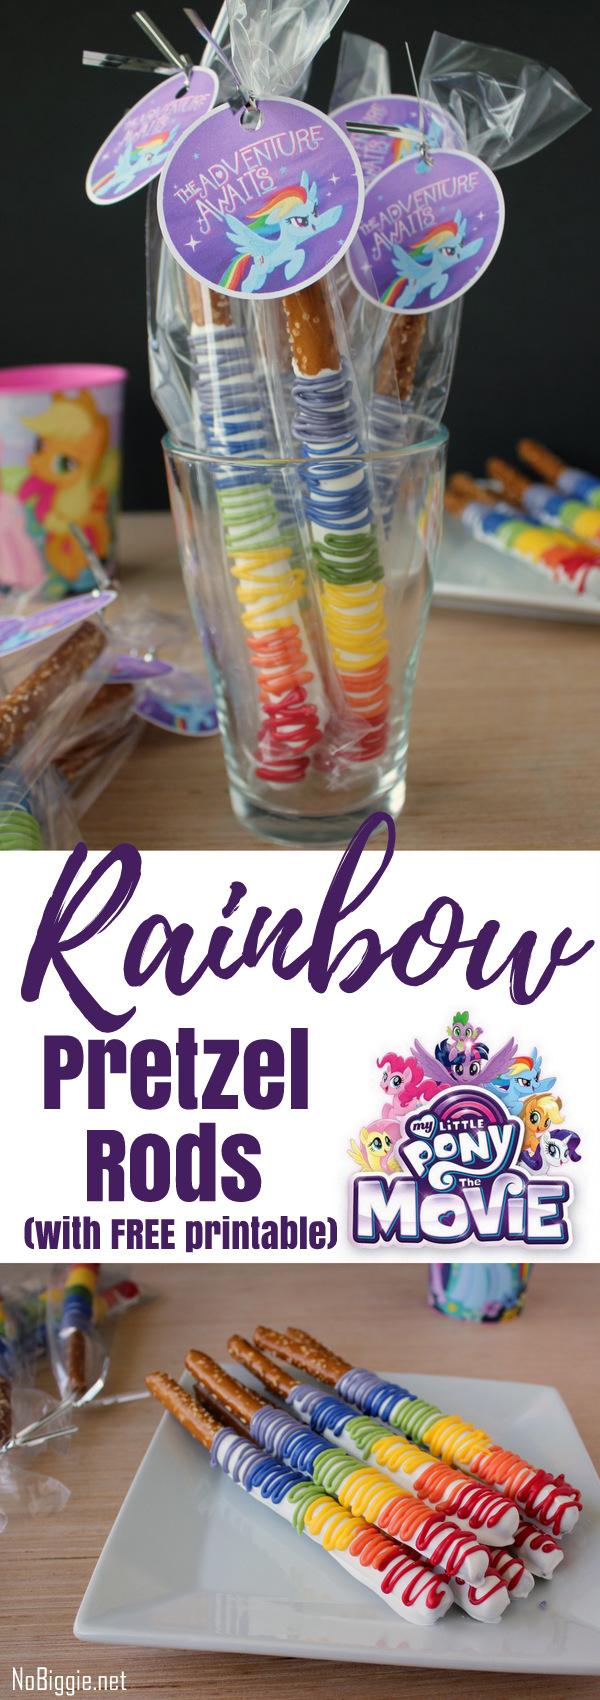 My Little Pony The Movie Rainbow Pretzel Rods | NoBiggie.net